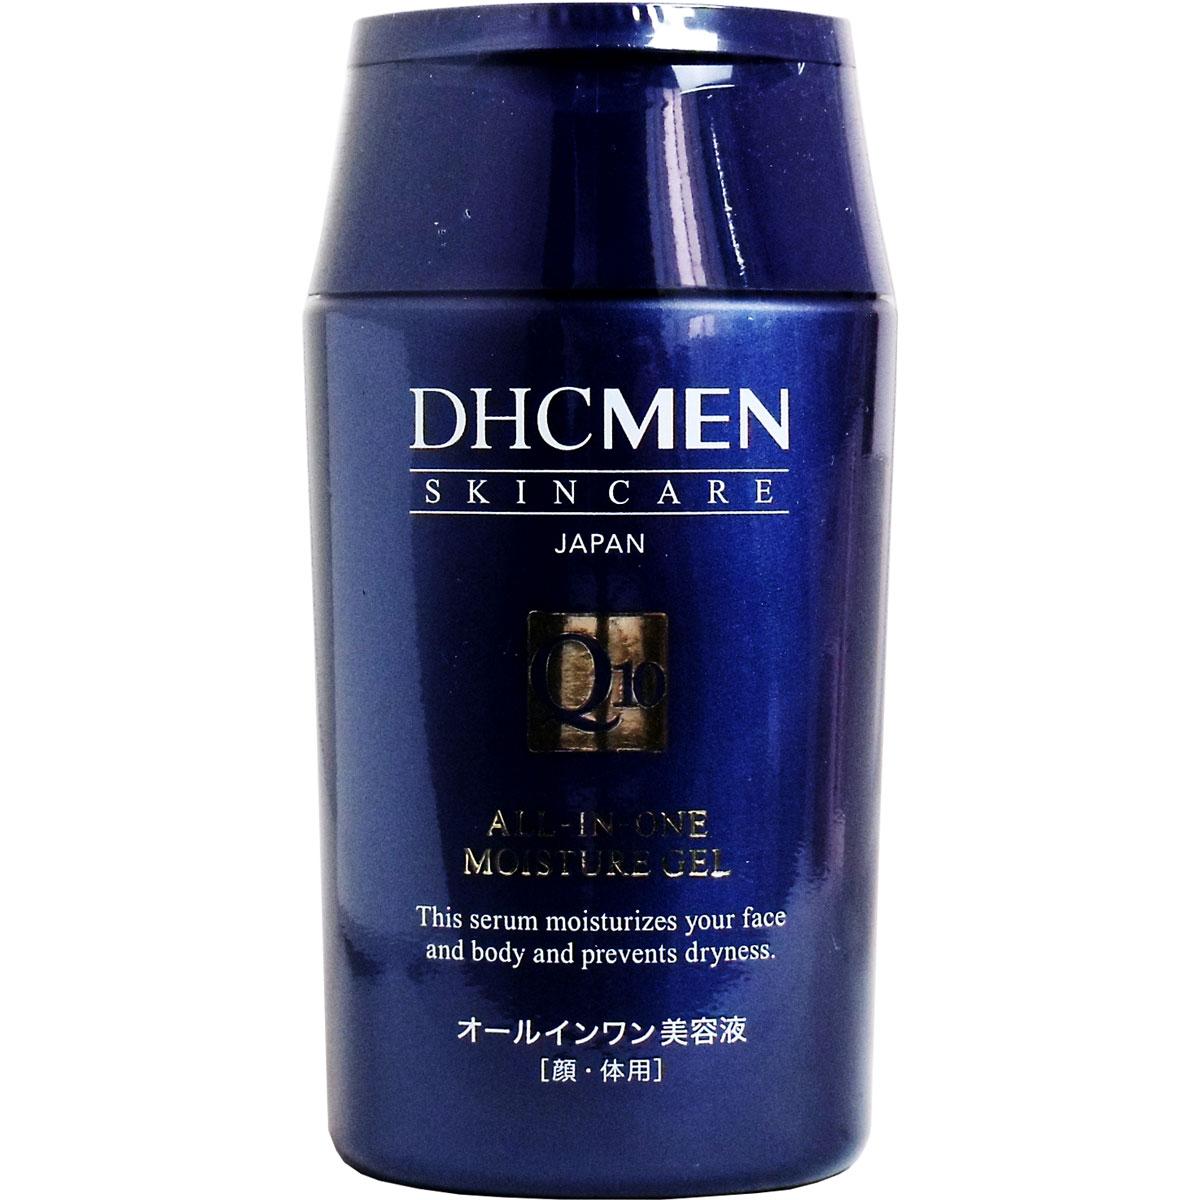 DHCMEN オールインワン モイスチュアジェル 200mL